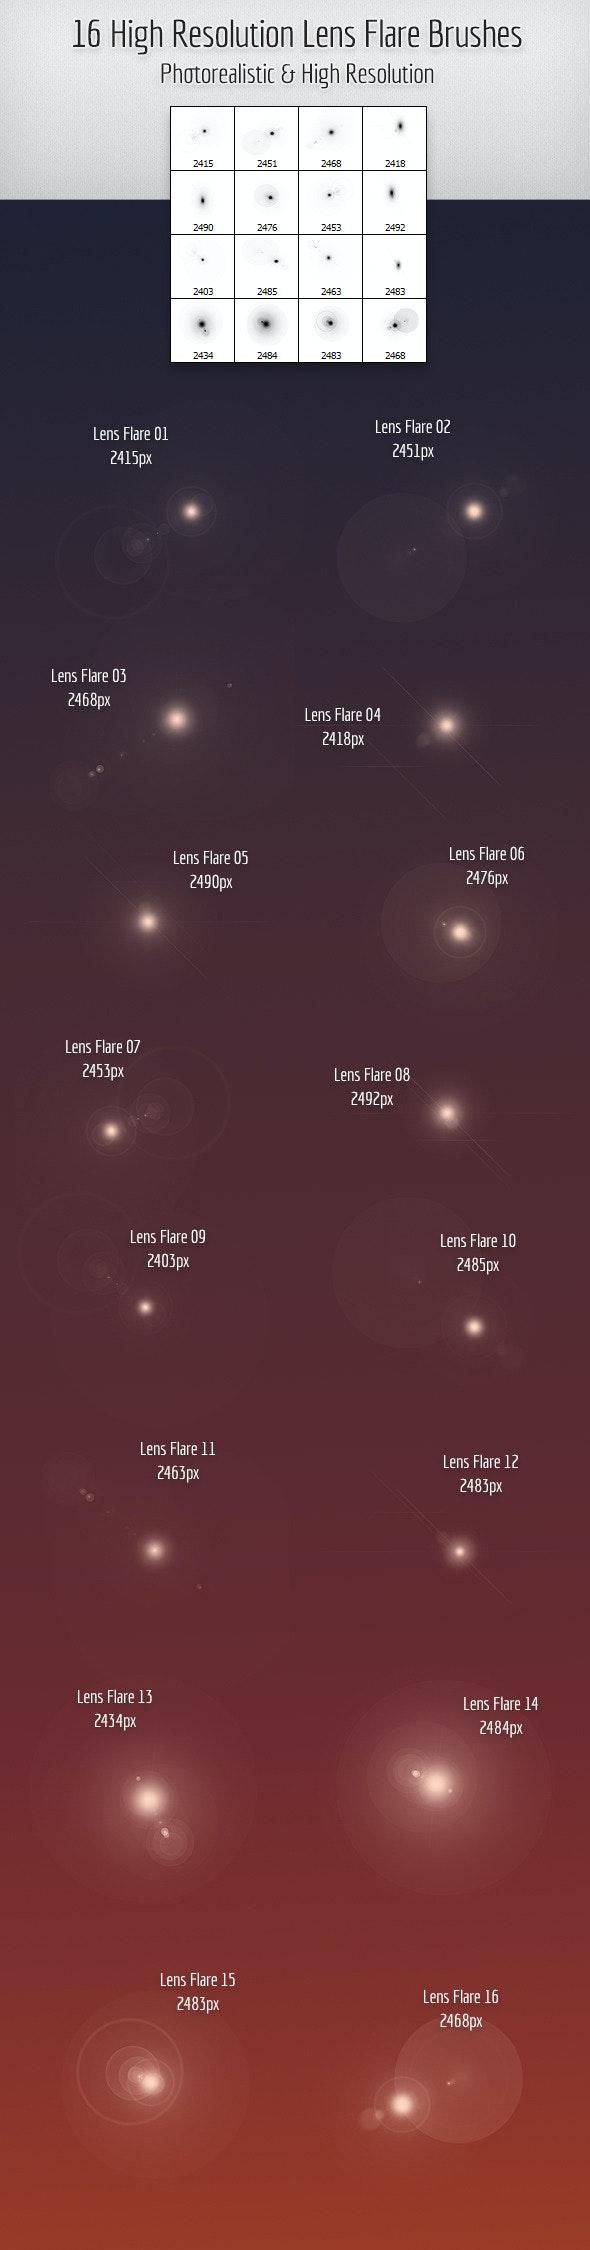 16 High Quality Lens Flare Brushes - Techno / Futuristic Brushes